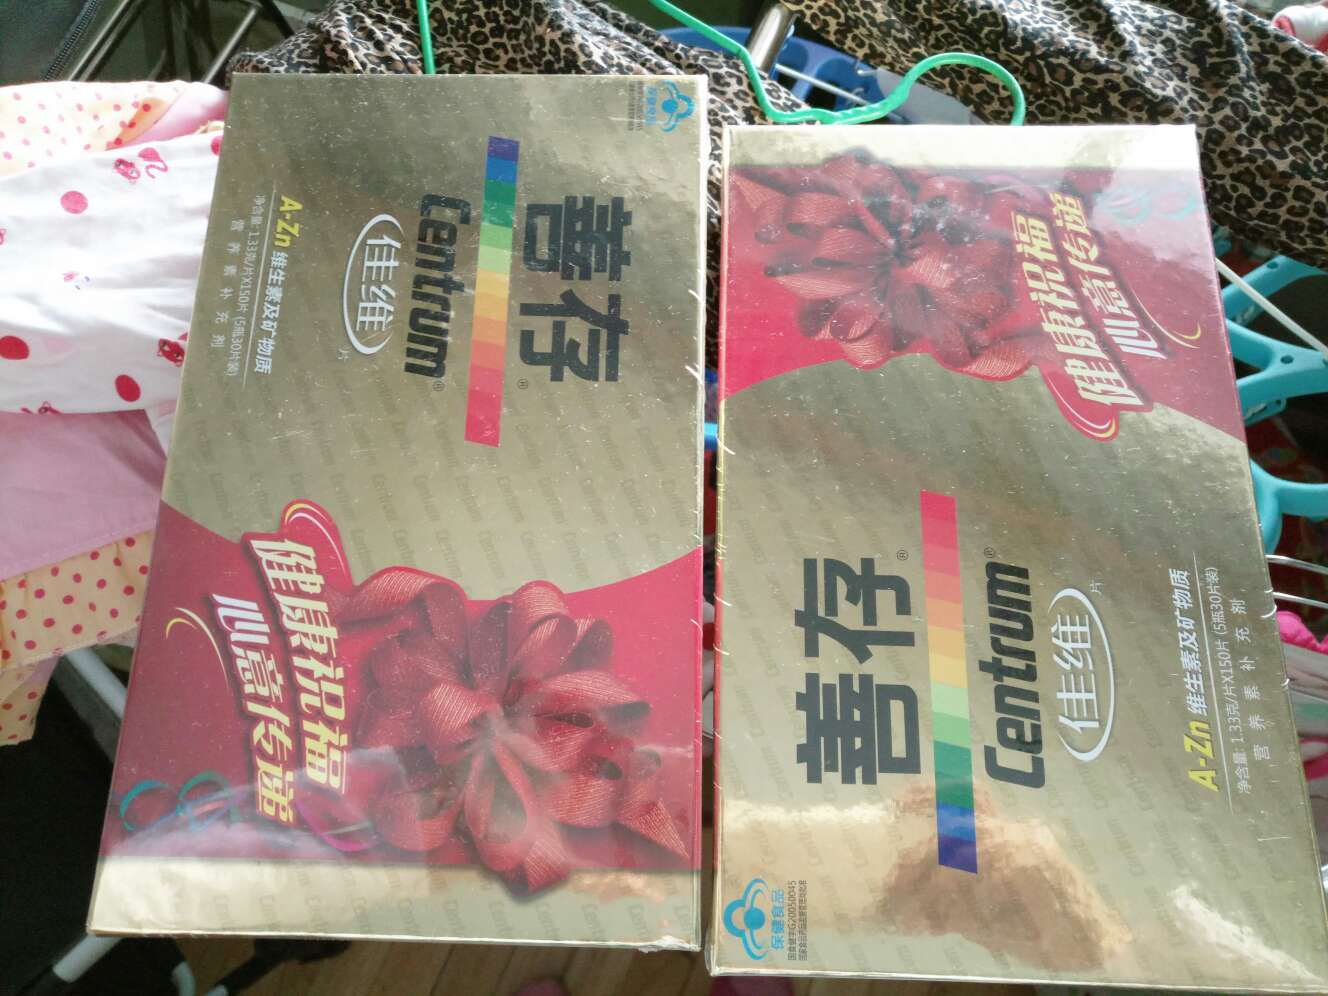 air jordan 6 free shipping reviews 00252981 forsale